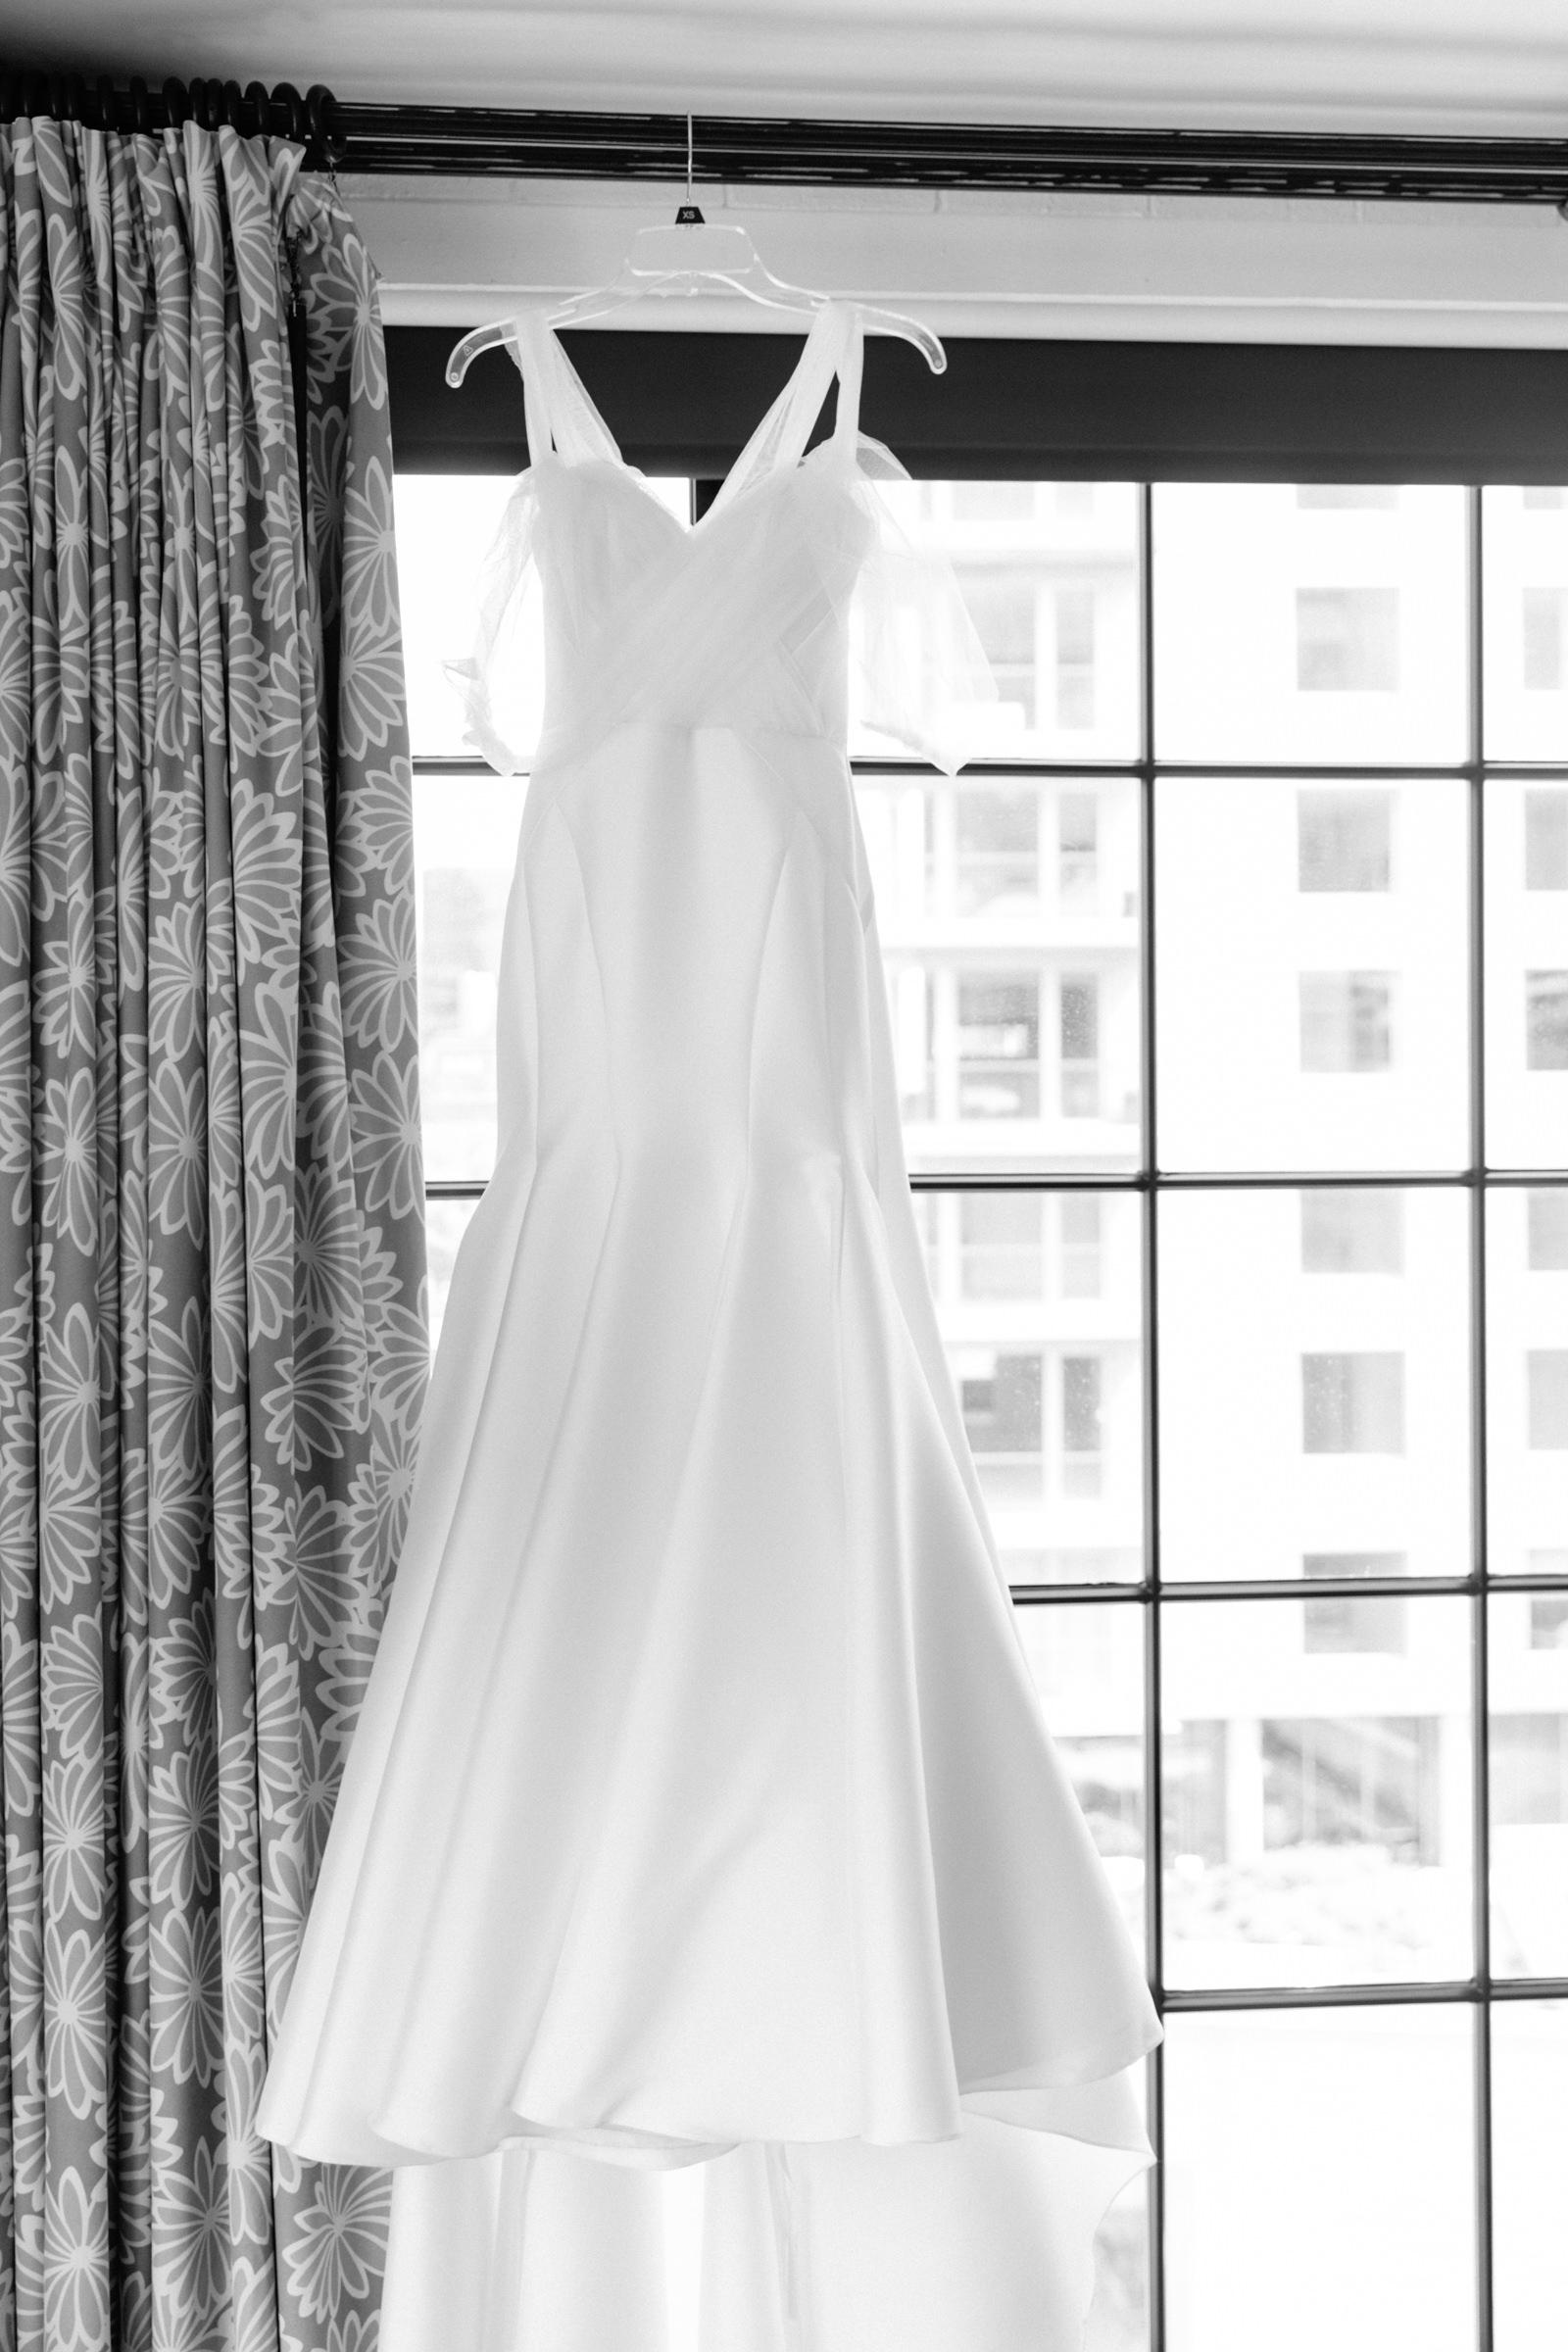 Intimate-NYC_wedding_ by Tanya Isaeva-8.jpg